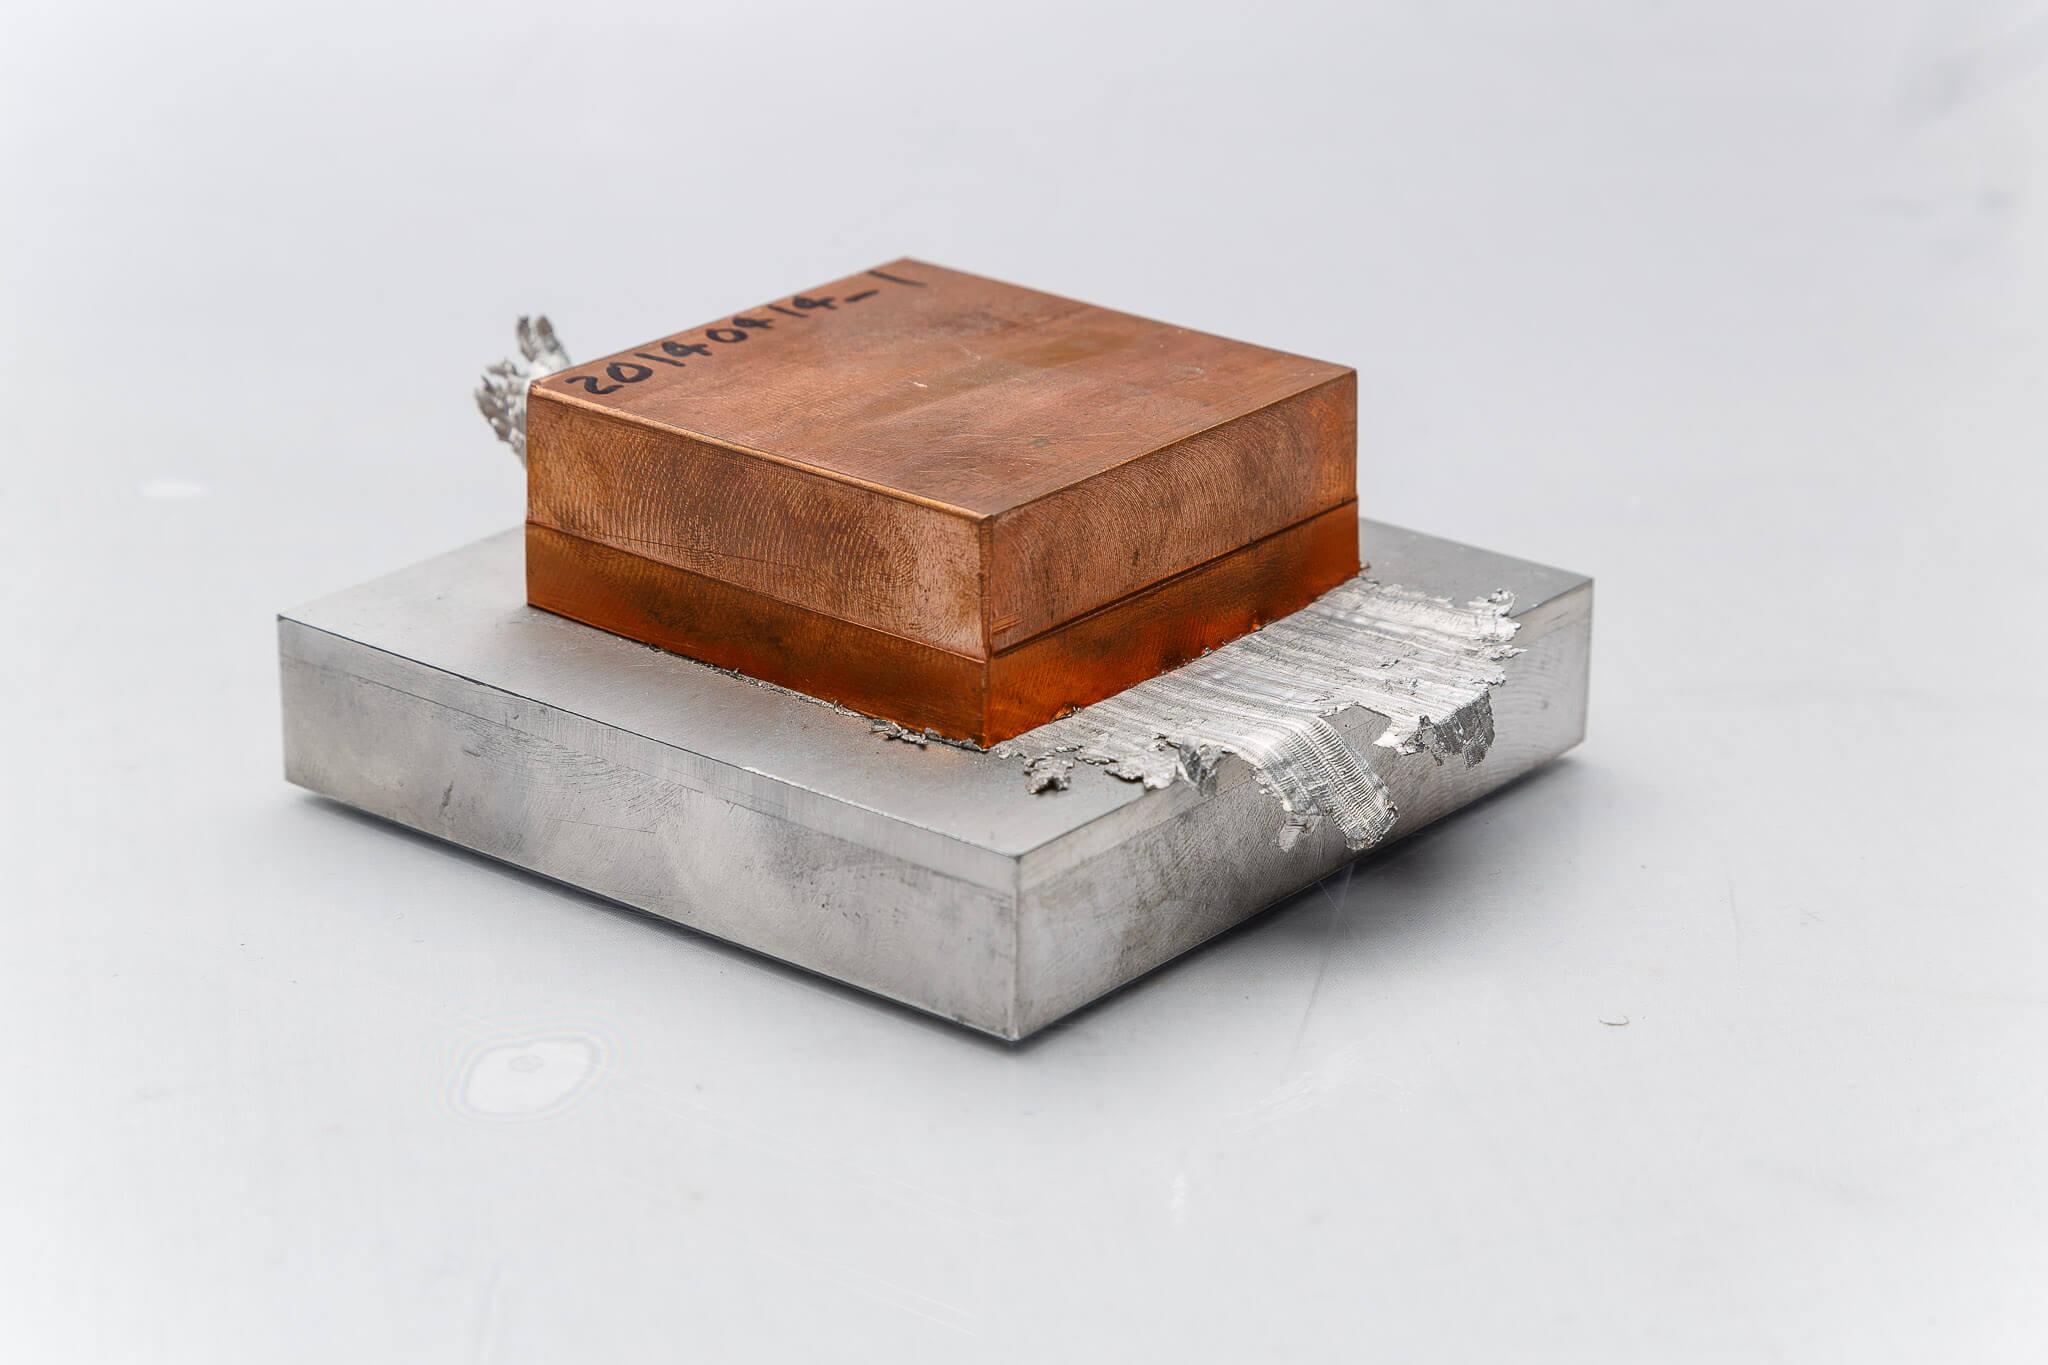 Bi-metallic application linear friction welding of copper alloy block to aluminum plate